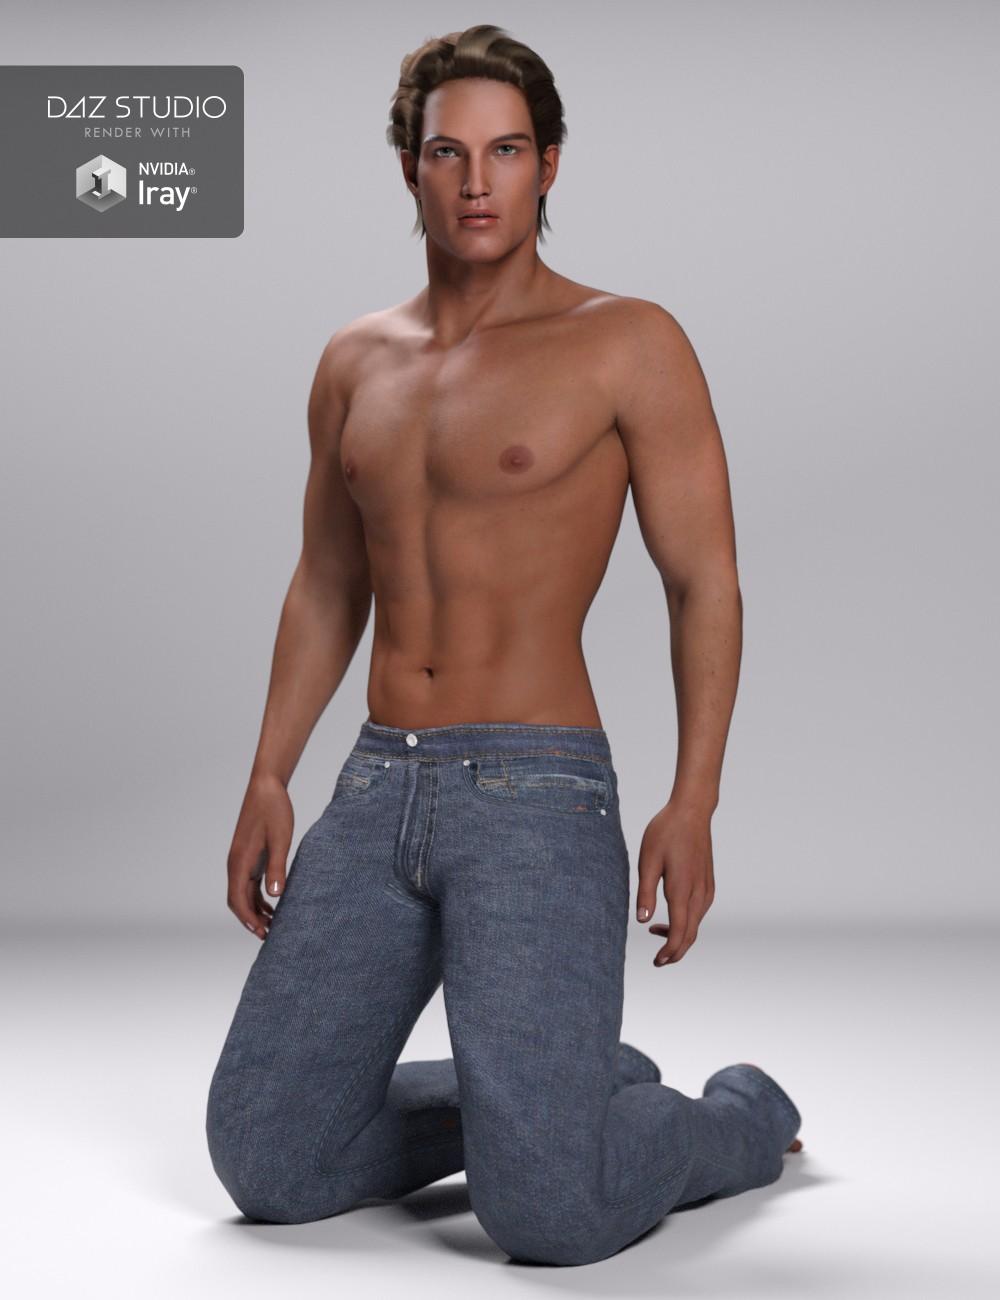 FW Derek HD for Michael 6 | Daz 3D